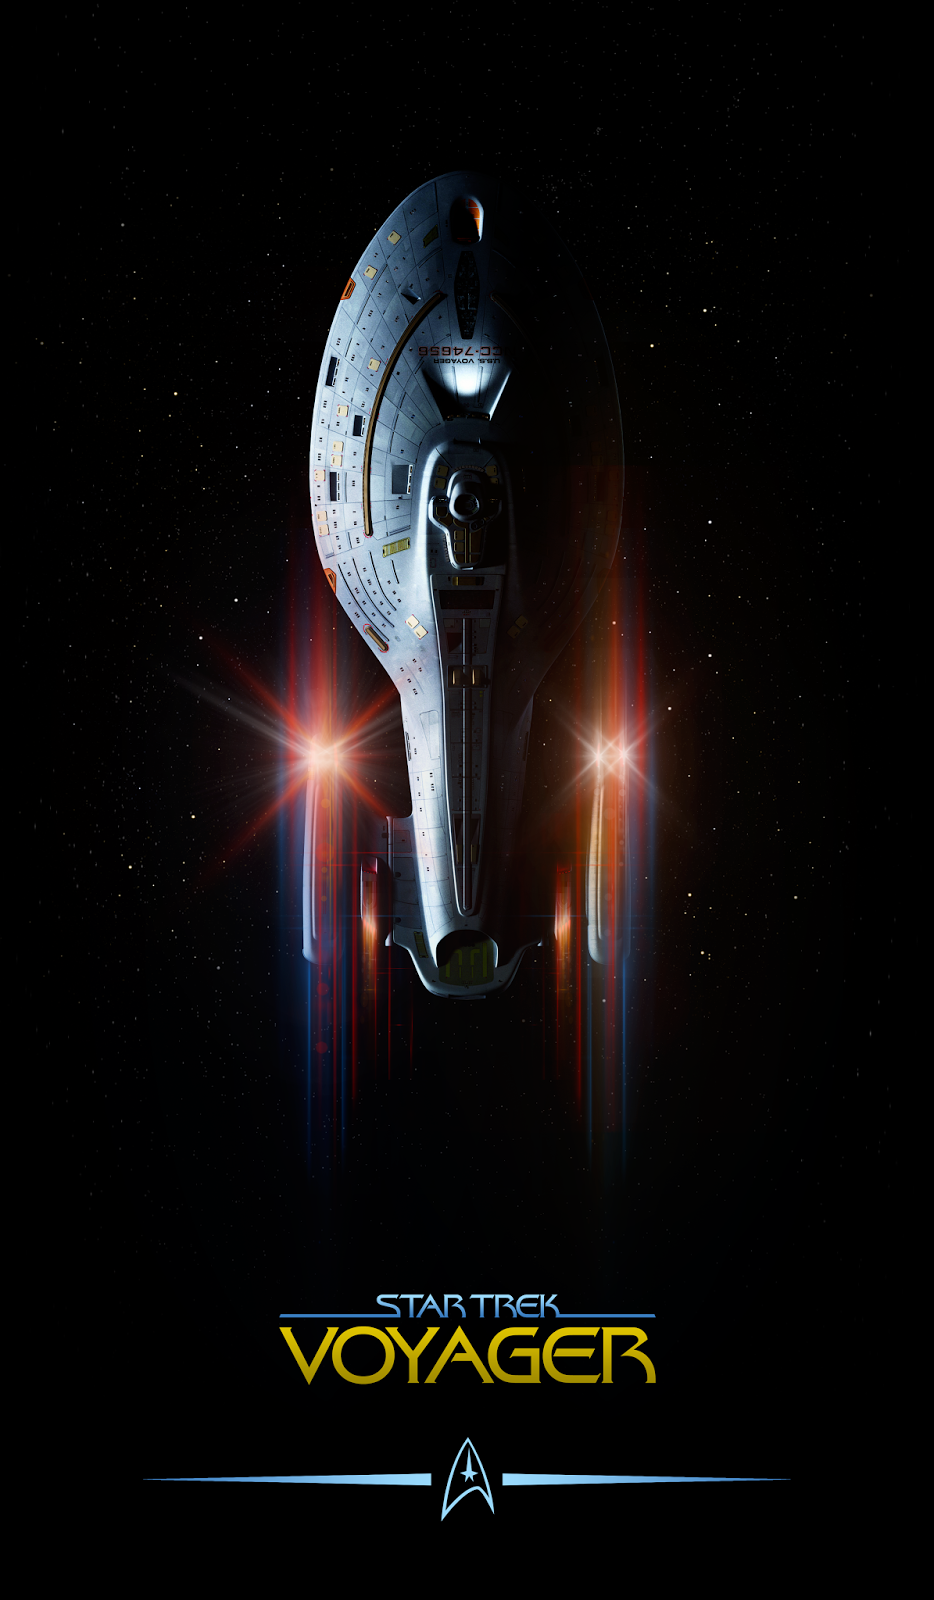 Enterprise Voyager